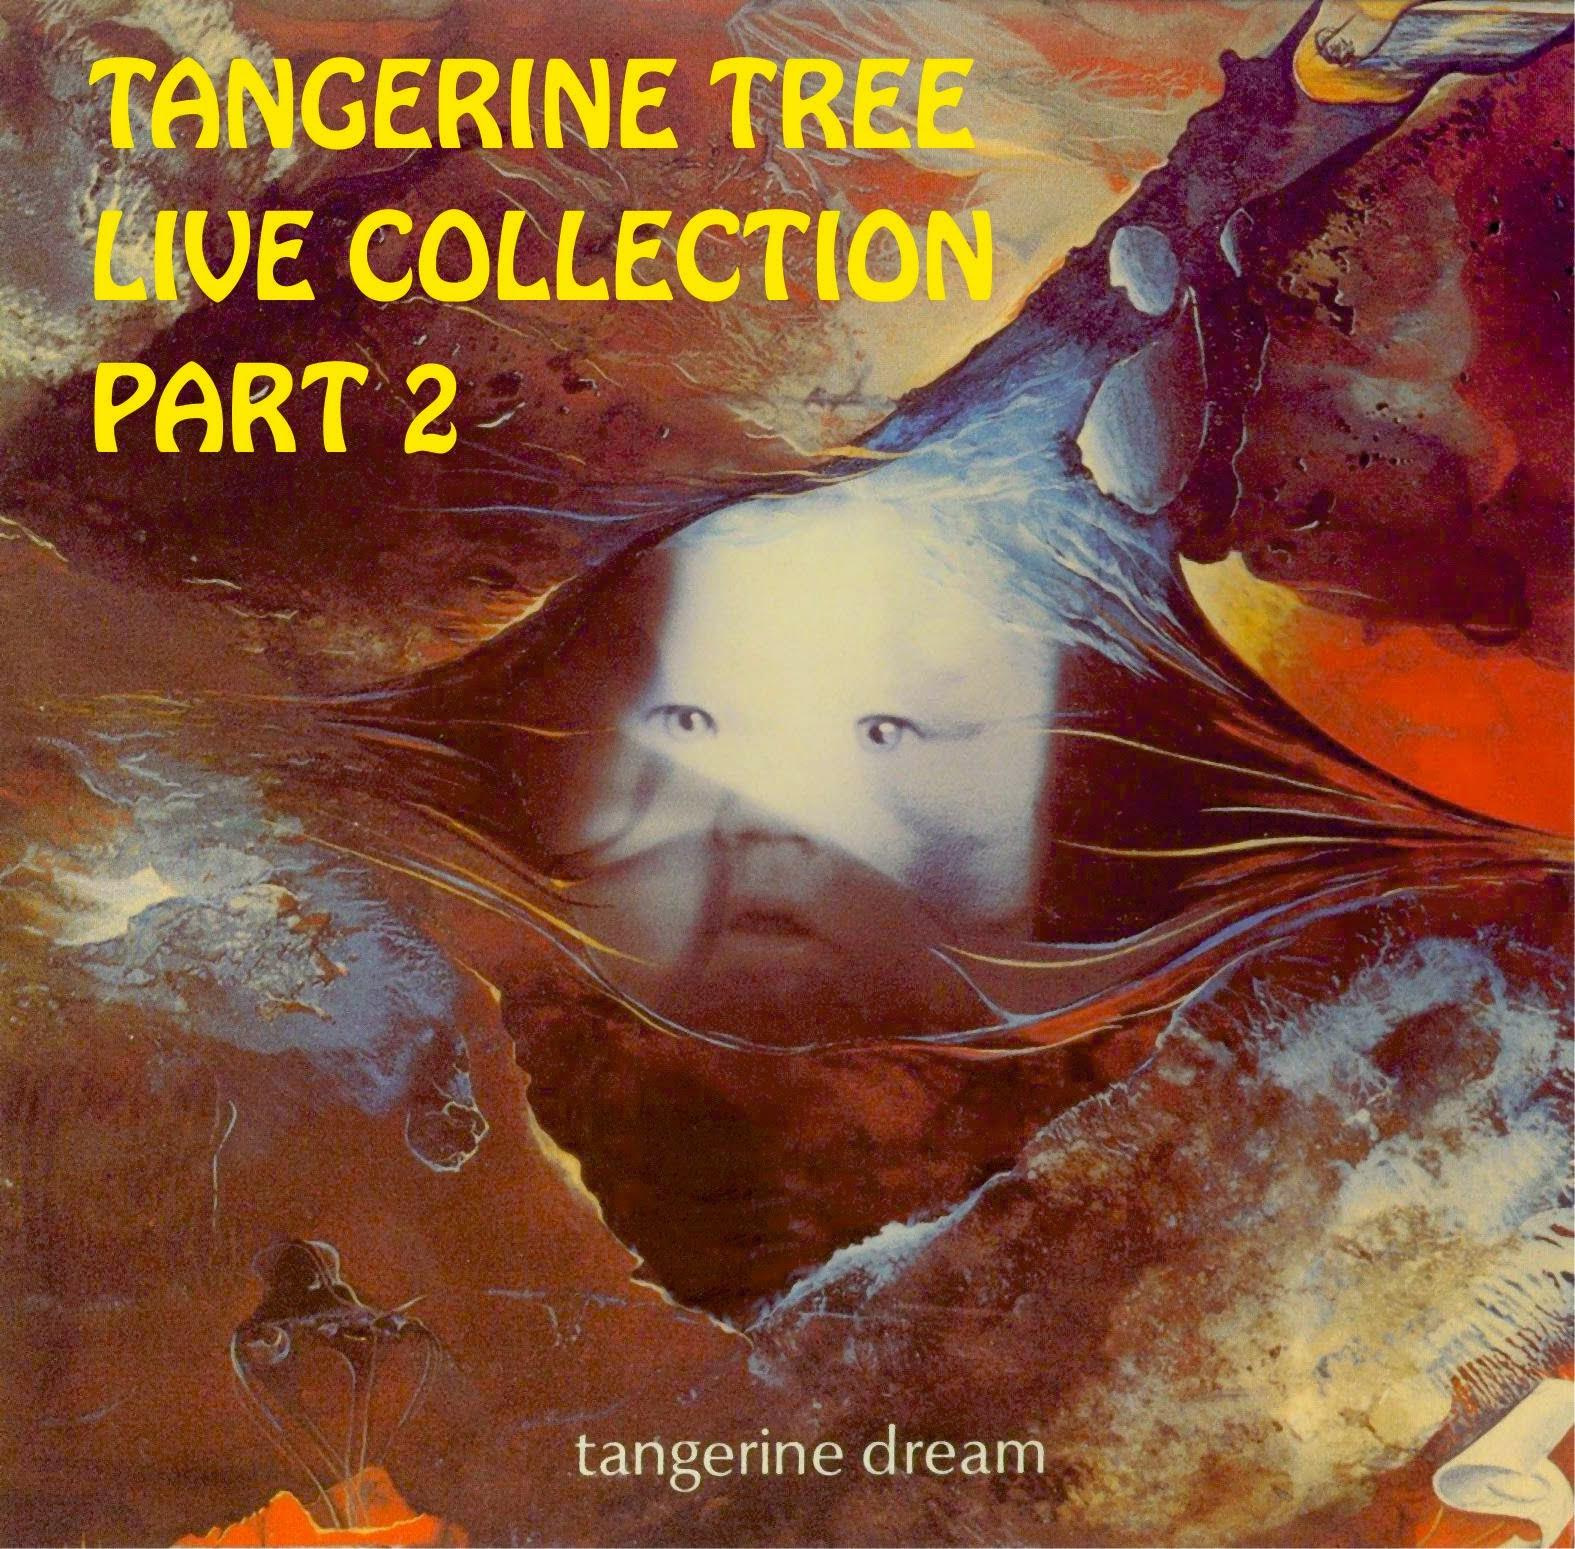 TANGERINE TREE SEGUNDA PARTE